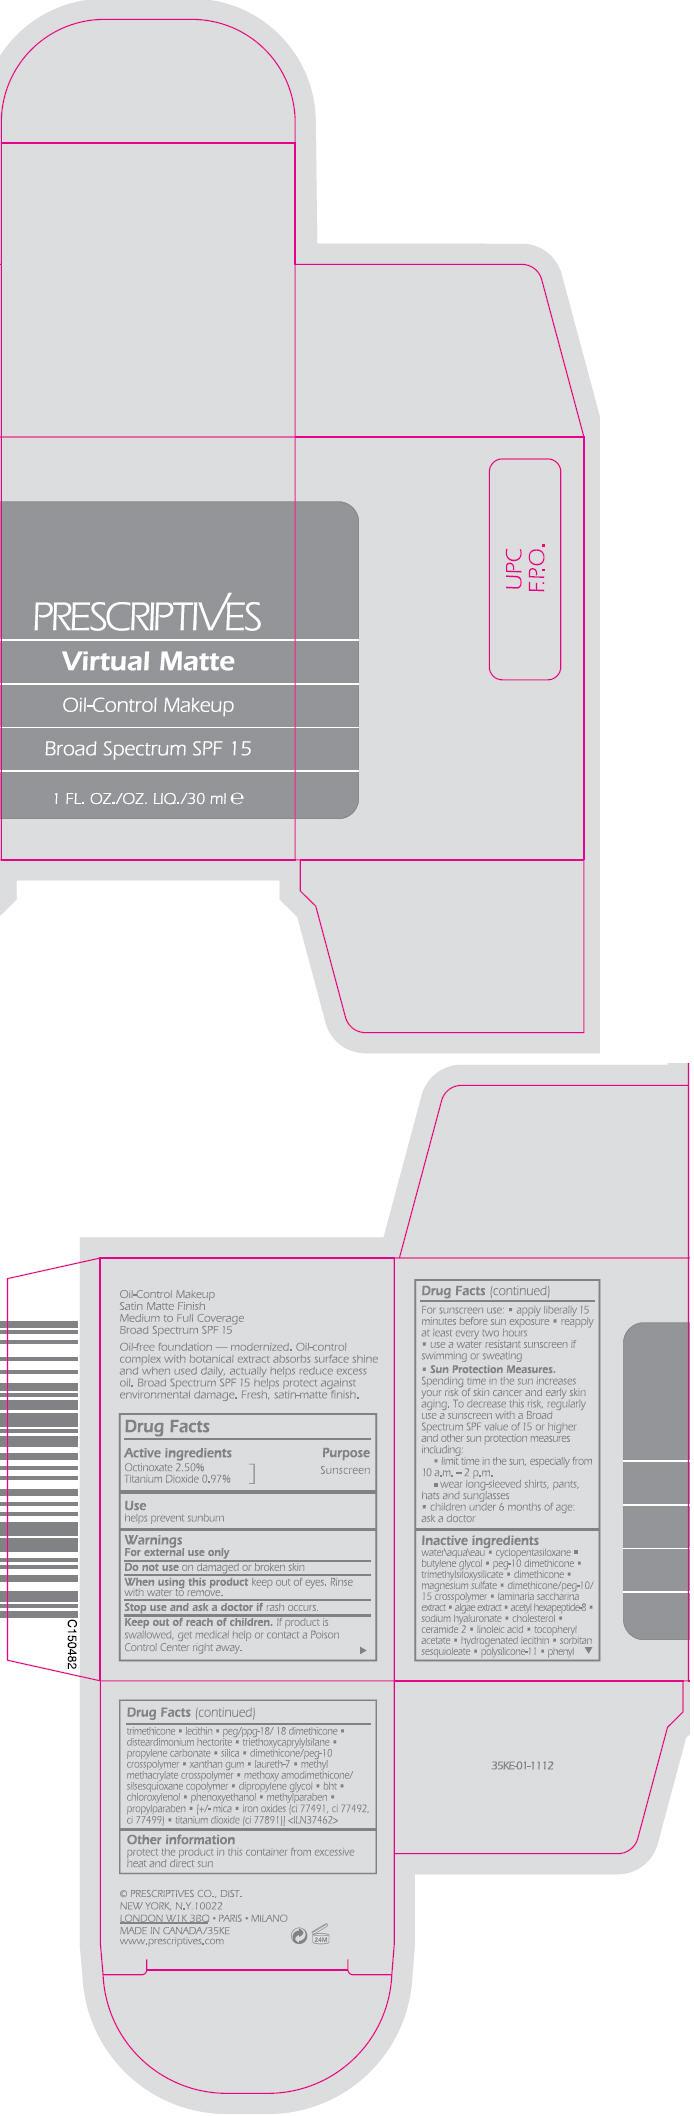 Virtual Matte Oil Control Makeup Broad Spectrum Spf 15 (Octinoxate And Titanium Dioxide) Liquid [Prescriptives Inc]